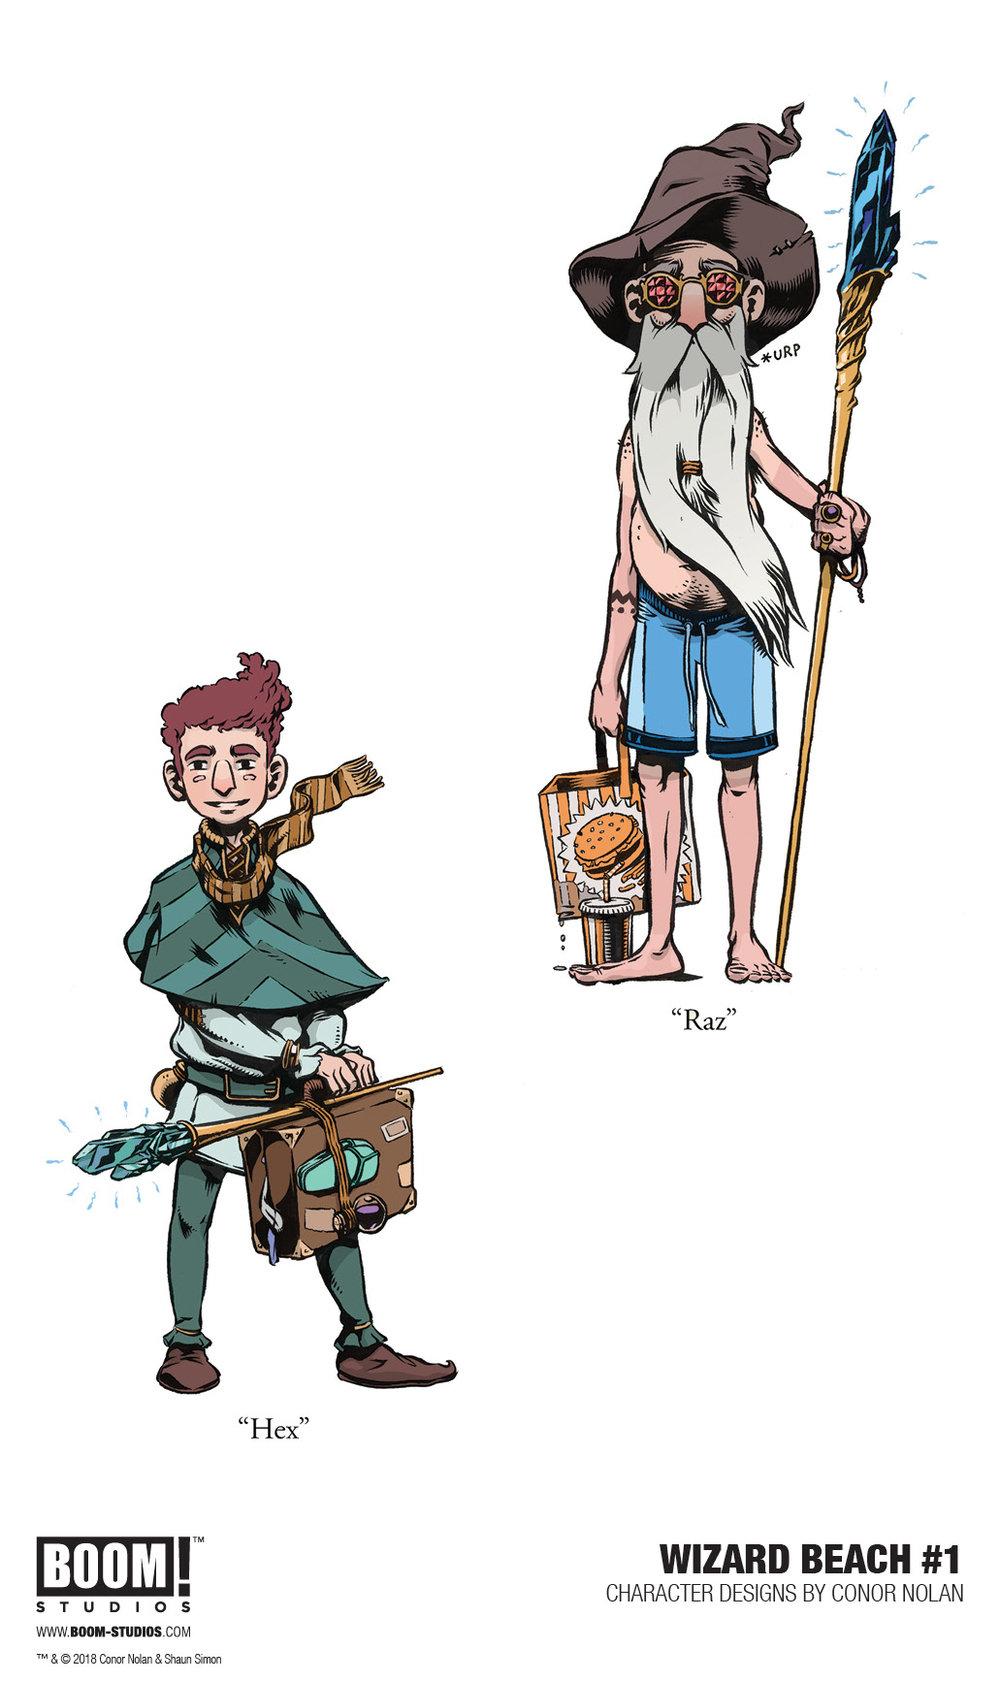 WizardBeach_001_CharacterArt_PROMO.jpg